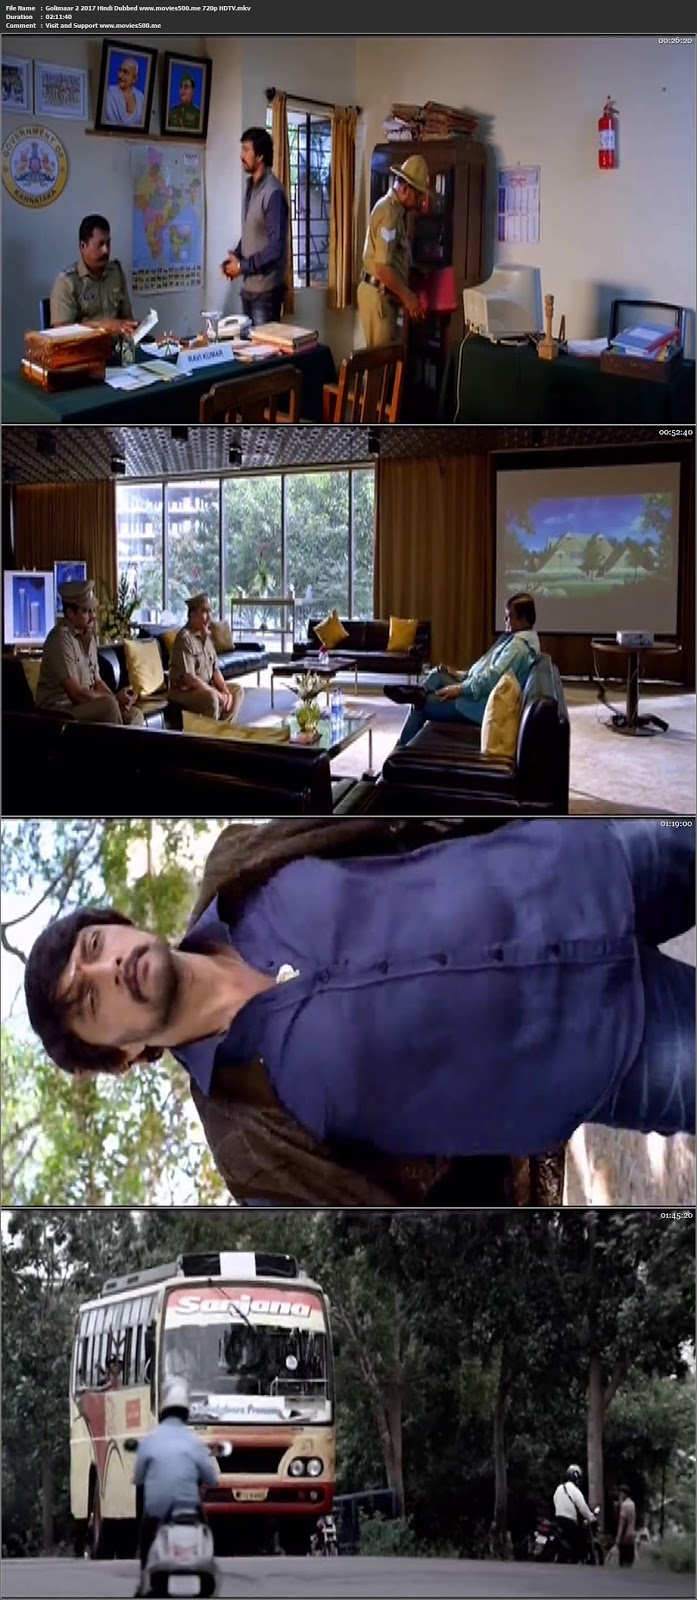 Golimaar 2 2017 Hindi Dubbed Download HDTV 720p at movies500.info